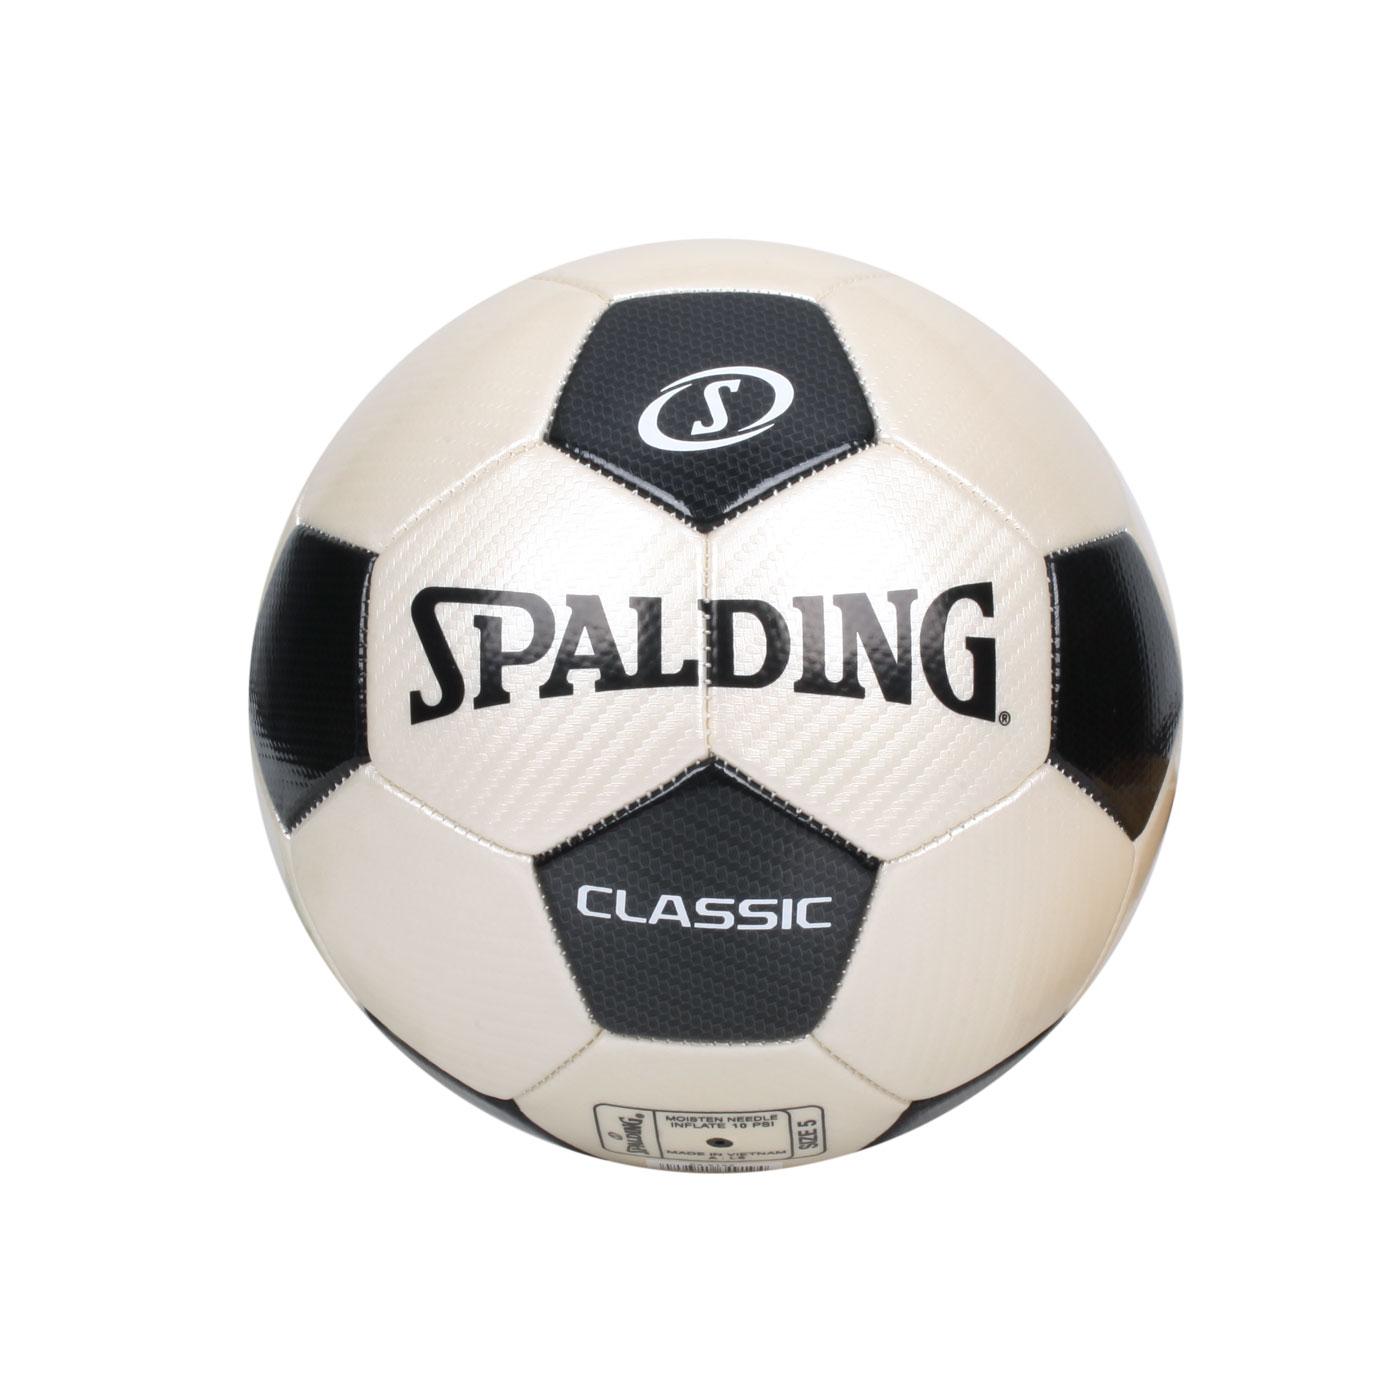 SPALDING 2.0經典#5號足球 SPA64919 - 米白黑